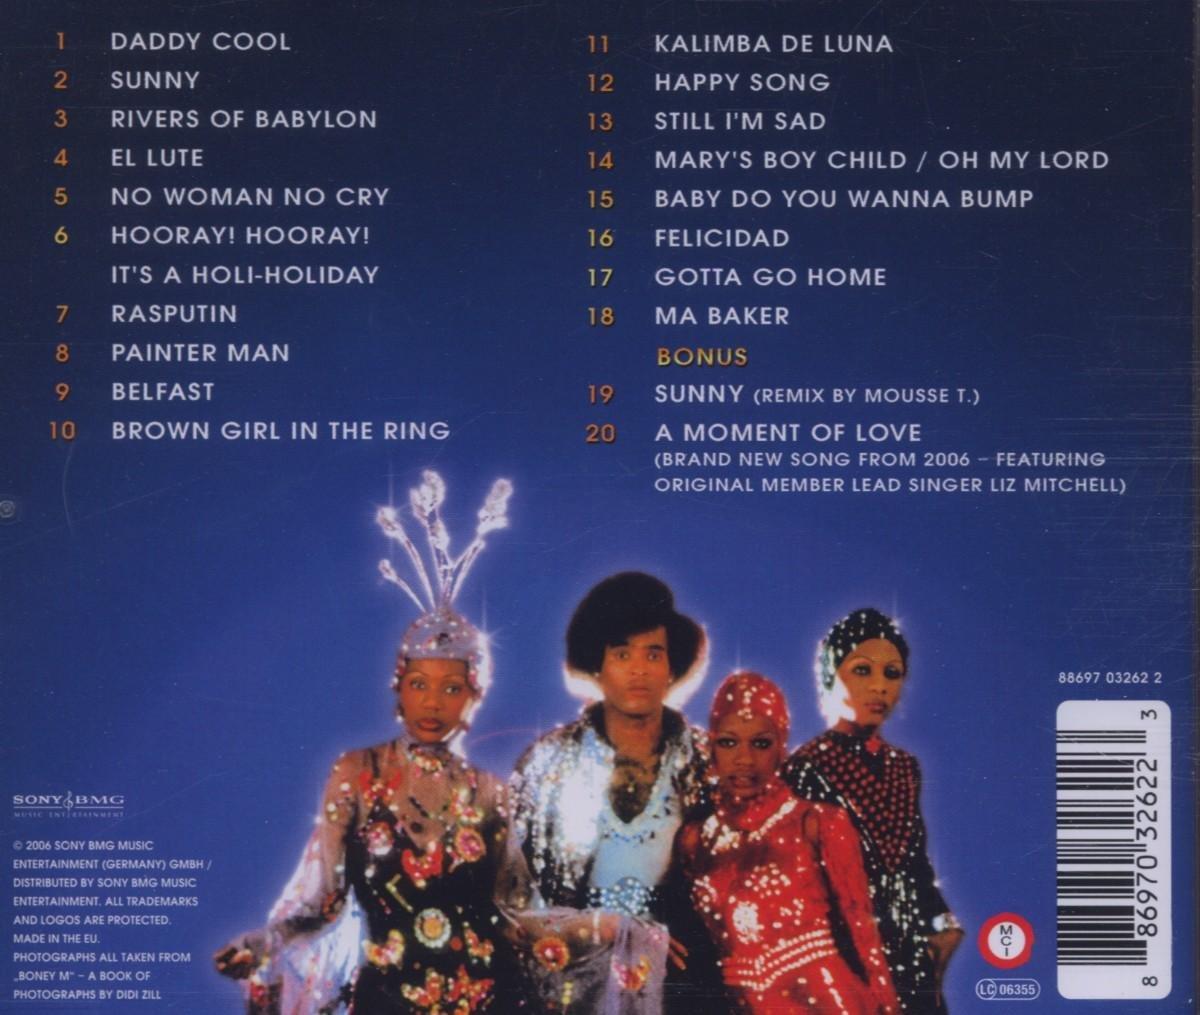 The Magic of Boney M. - Boney M.: Amazon.de: Musik